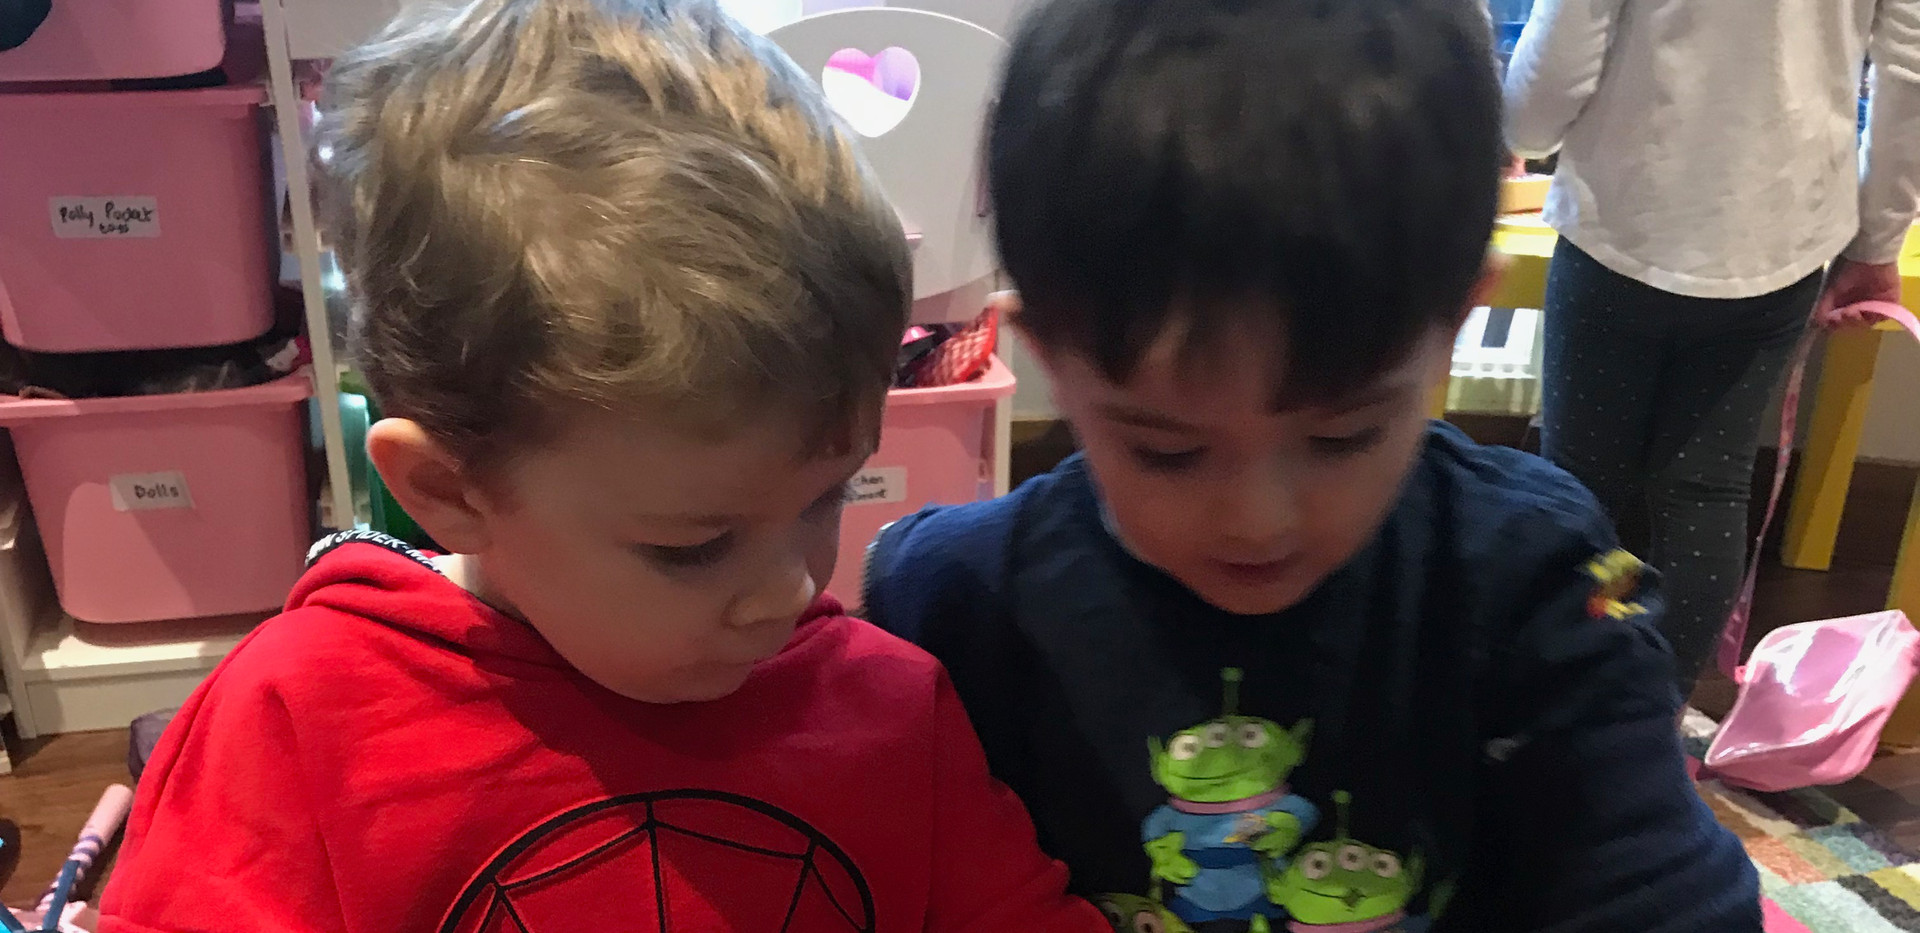 Having fun in the playroom